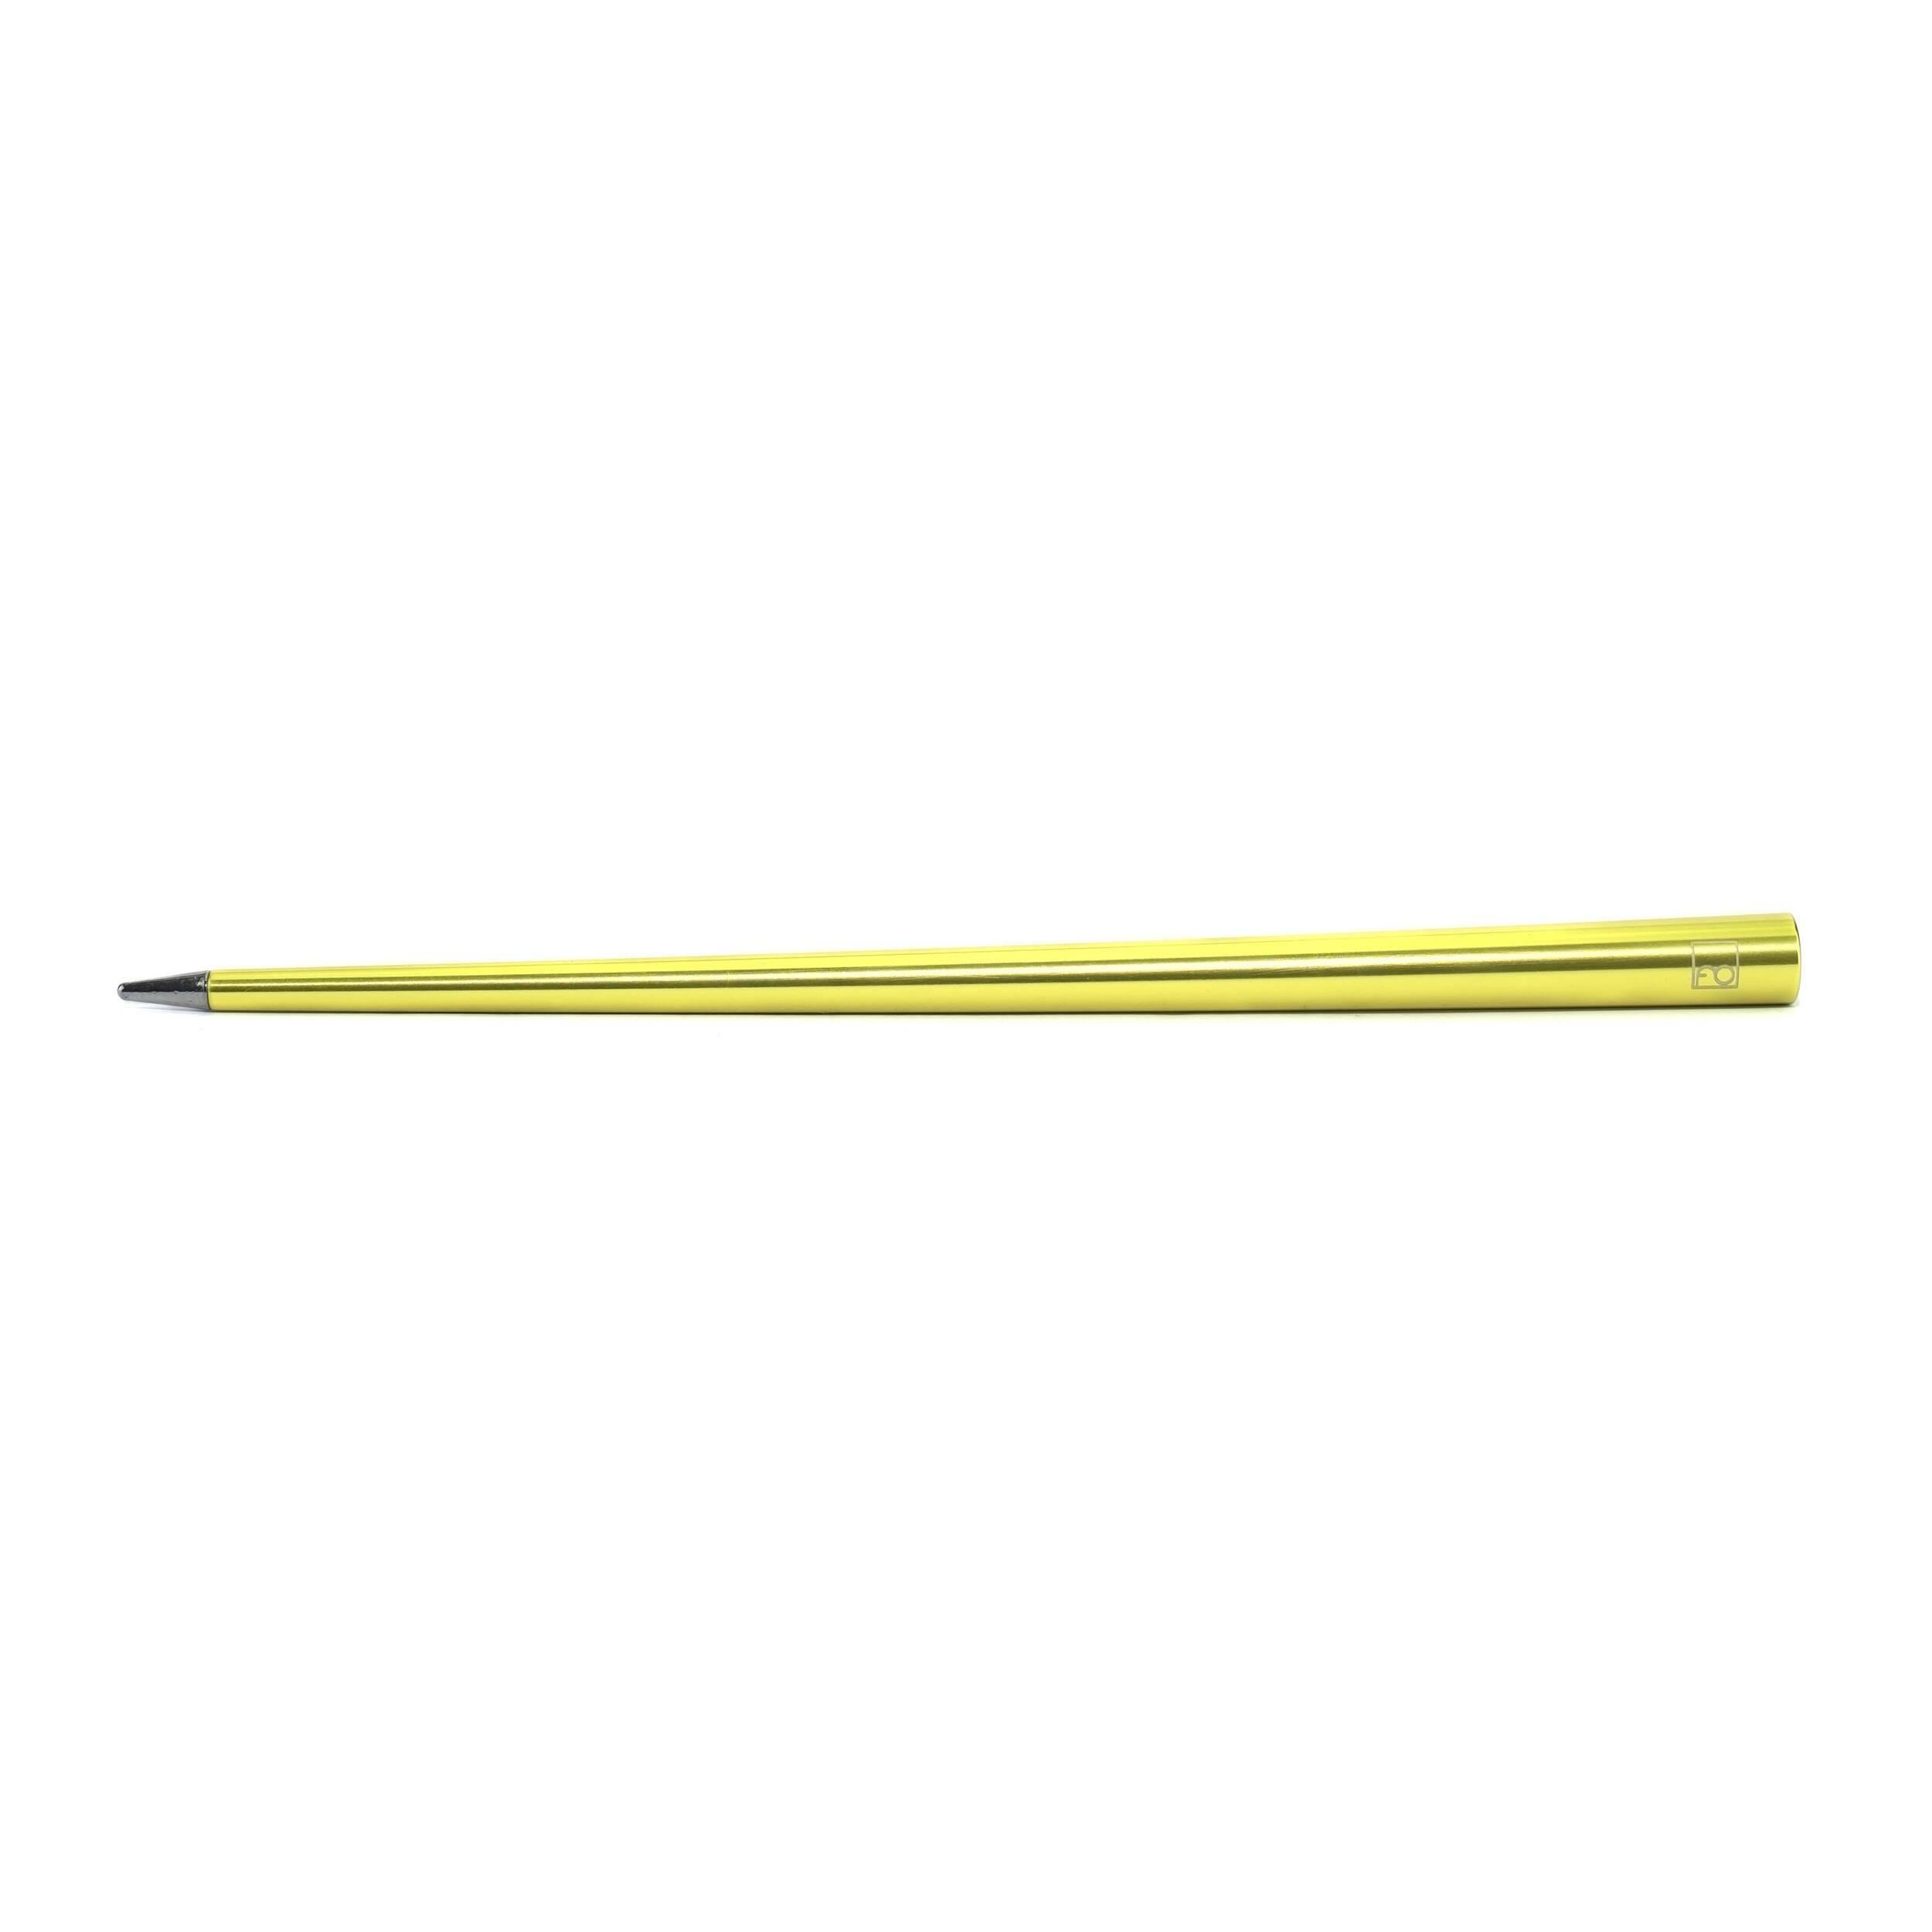 Вечный карандаш Napkin Forever Prima вечный карандаш napkin forever prima star wars millennium falcon серебристый